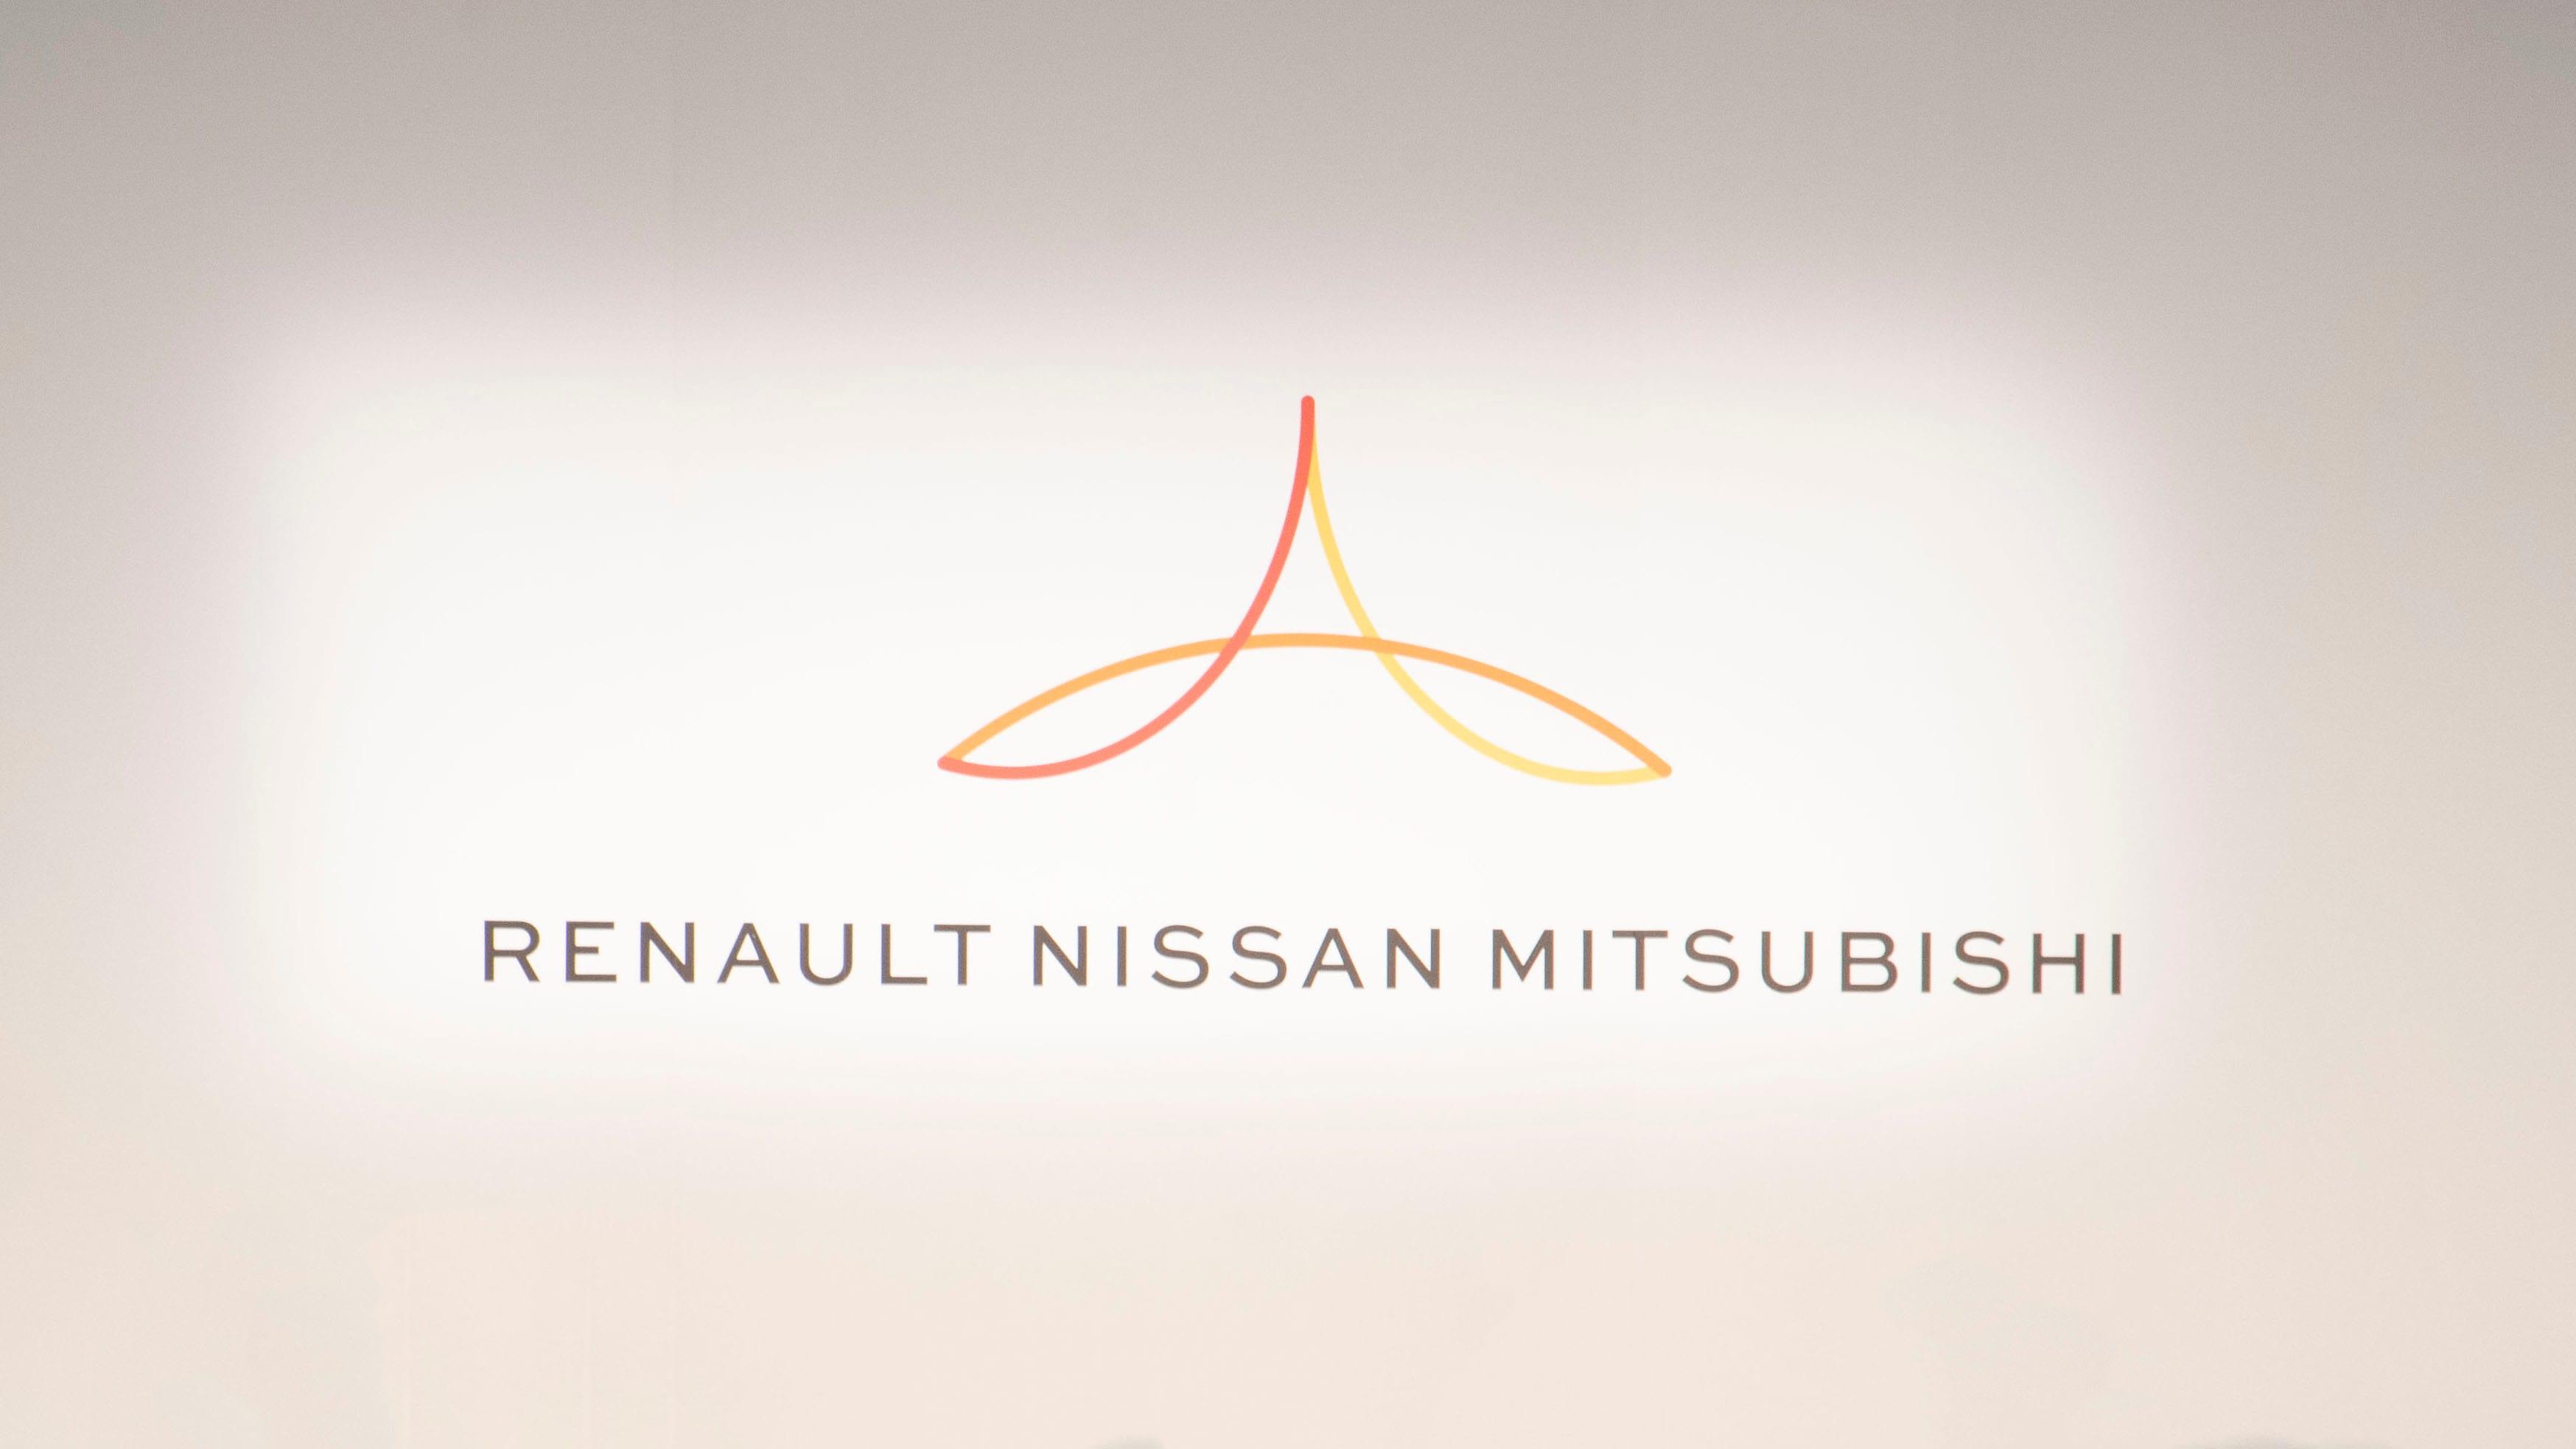 Renault-Nissan-Mitsubishi signs autonomous car deal with Google